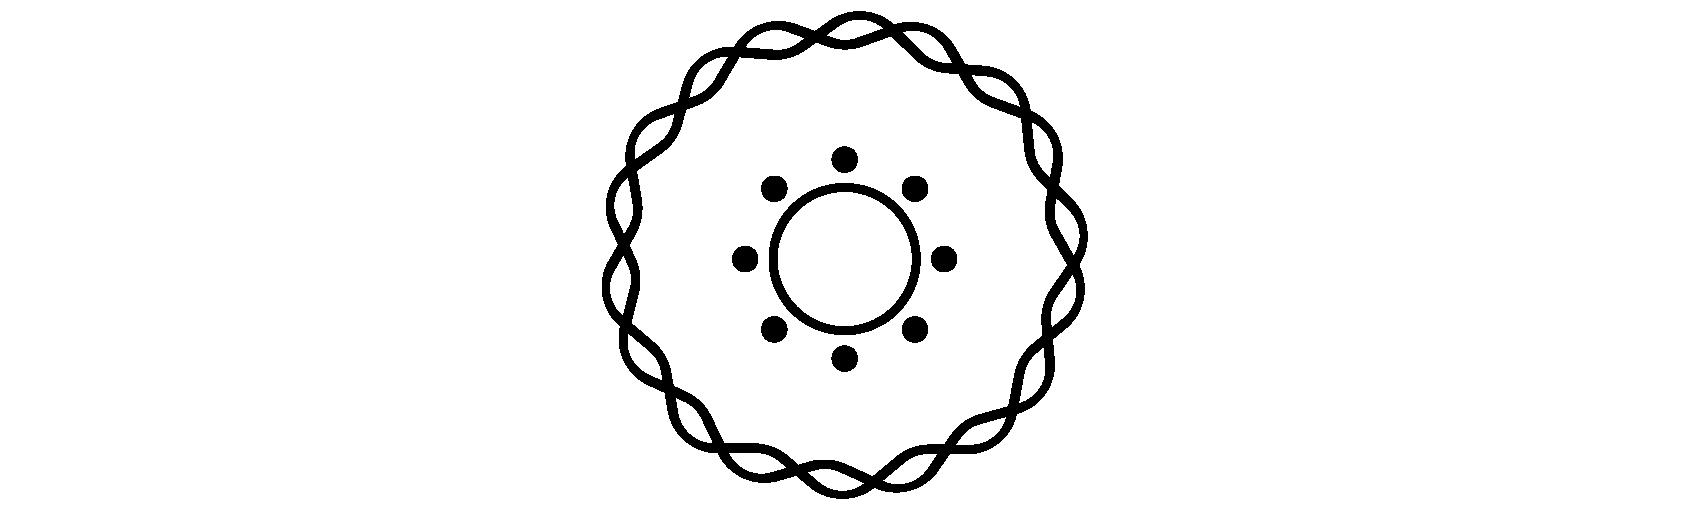 RAW-Membership-Icons-11.png